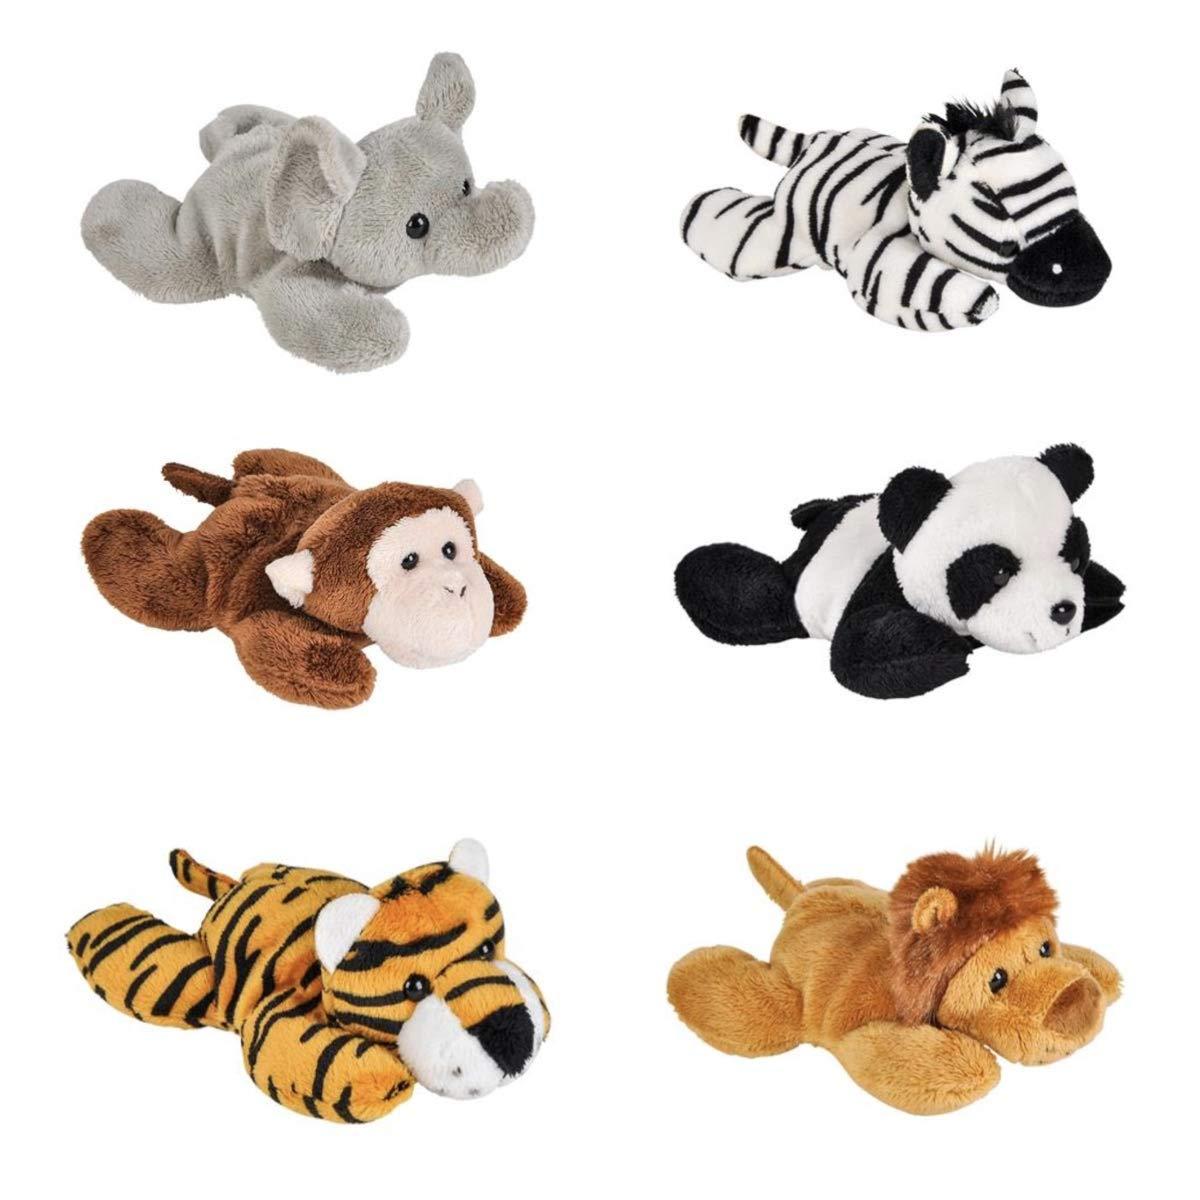 Adventure Planet - Six (6) Zoo Animal Mini 5'' Plush Animals - Monkey Elephant Lion Tiger Zebra & Panda - Party Favors Stocking Stuffer - Gift Stuffed with Beans Toys Jungle Safari by Adventure Planet